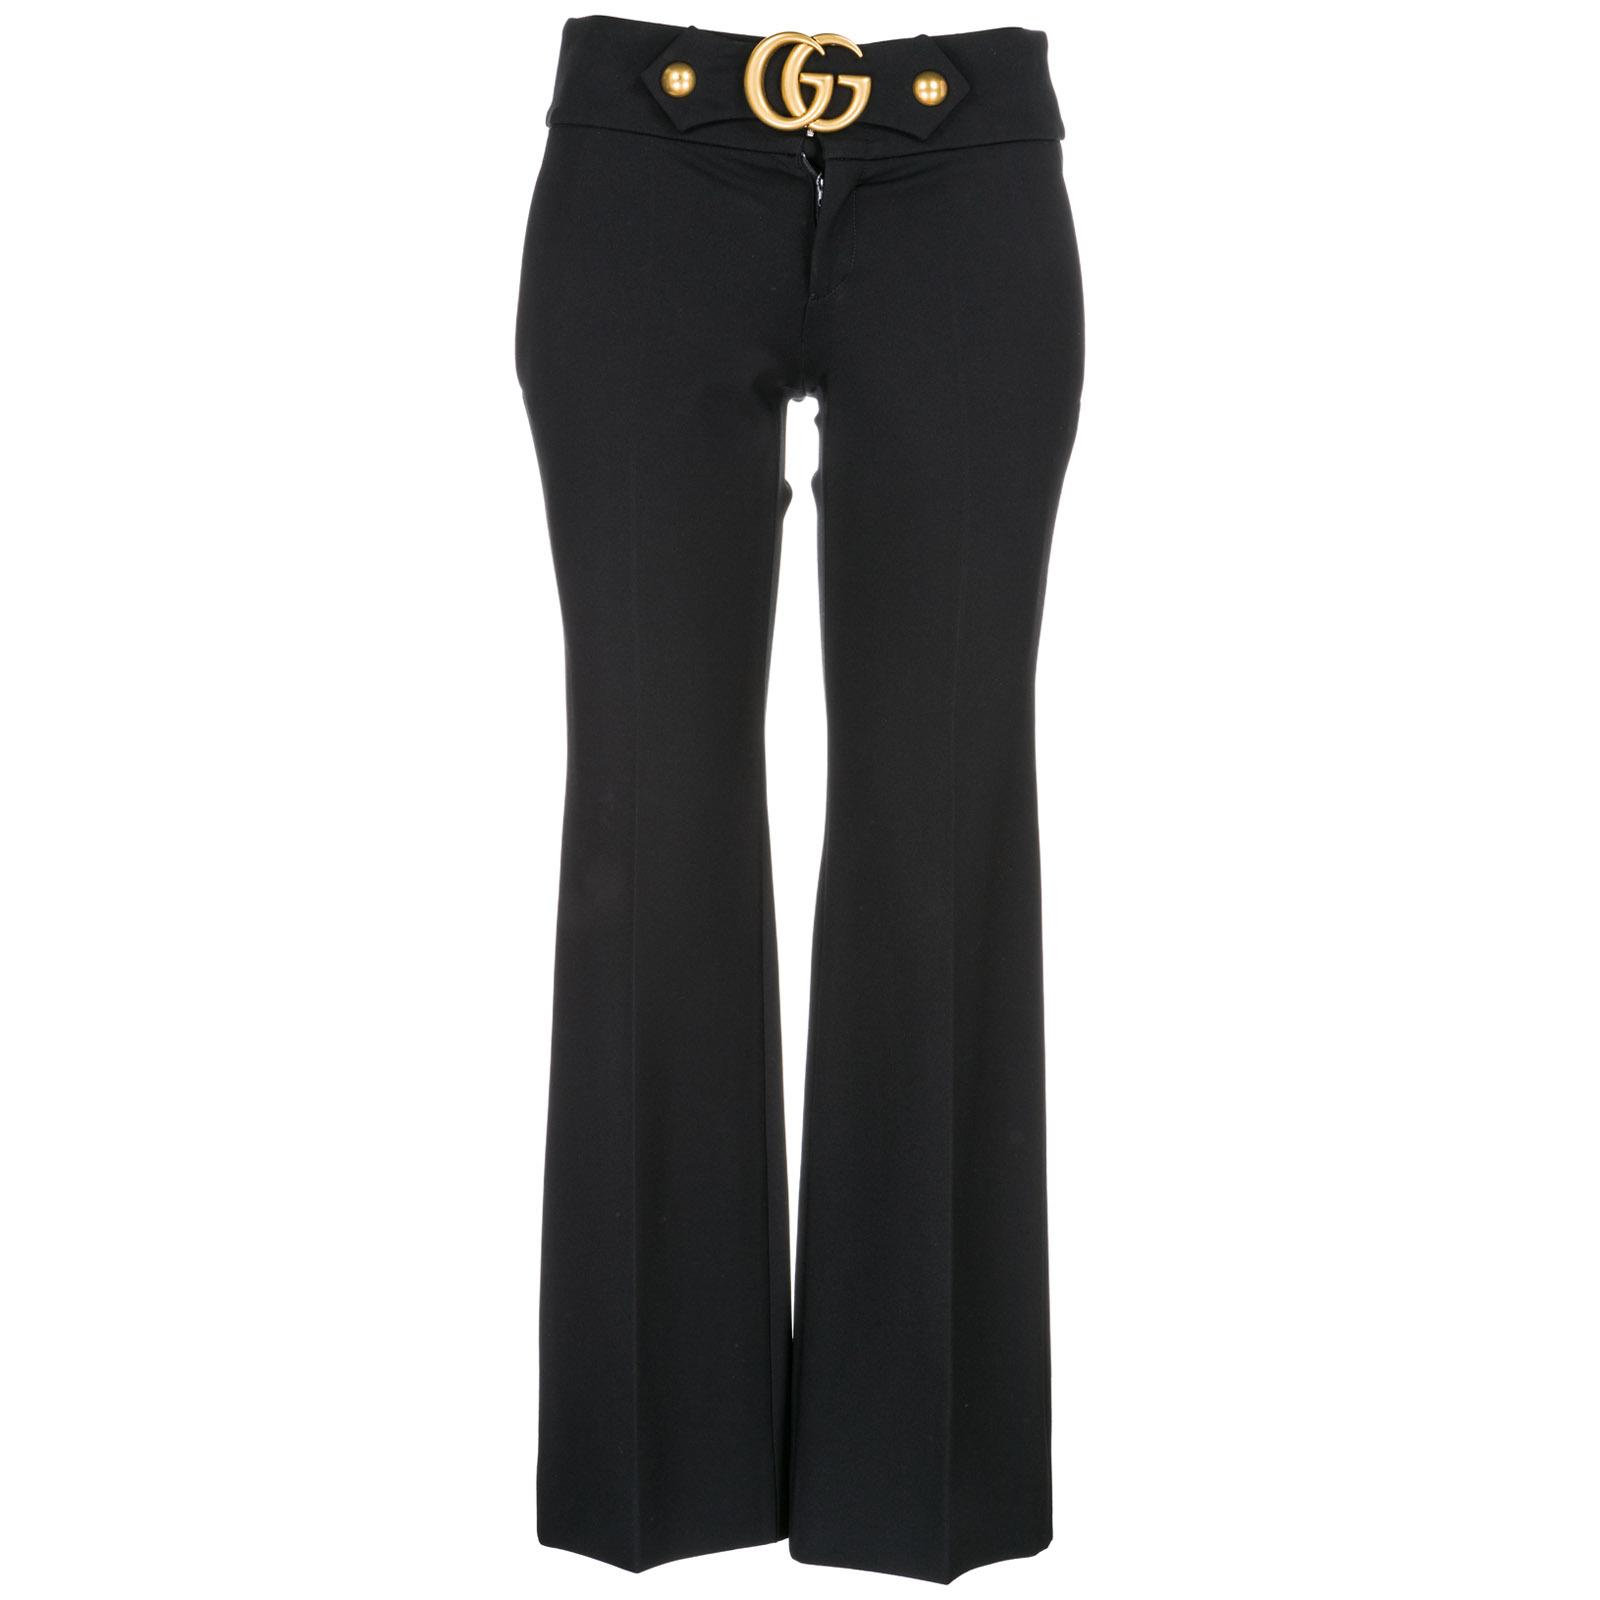 Women's trousers pants